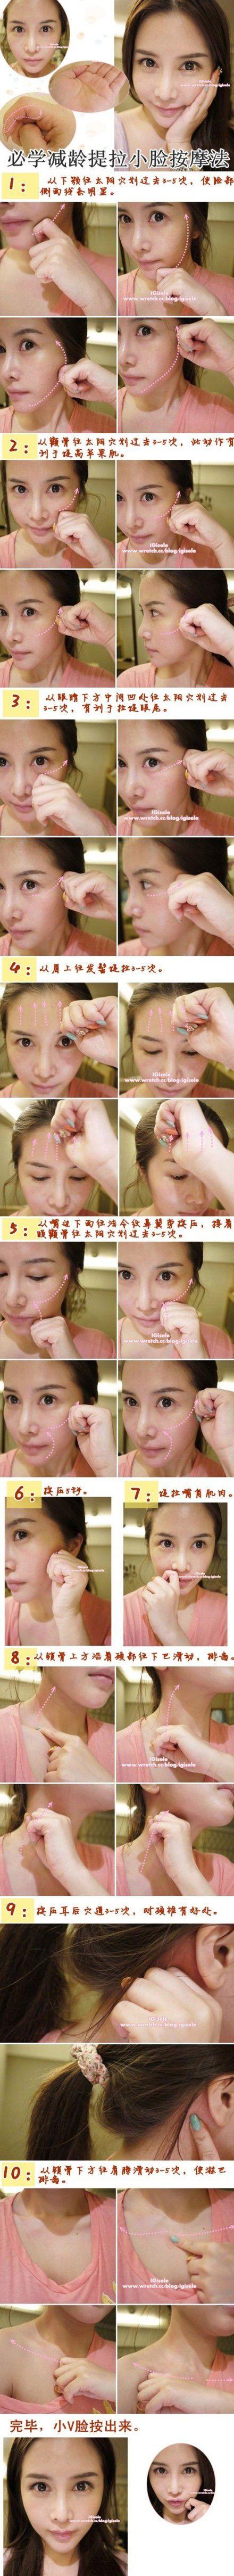 V shape face massage